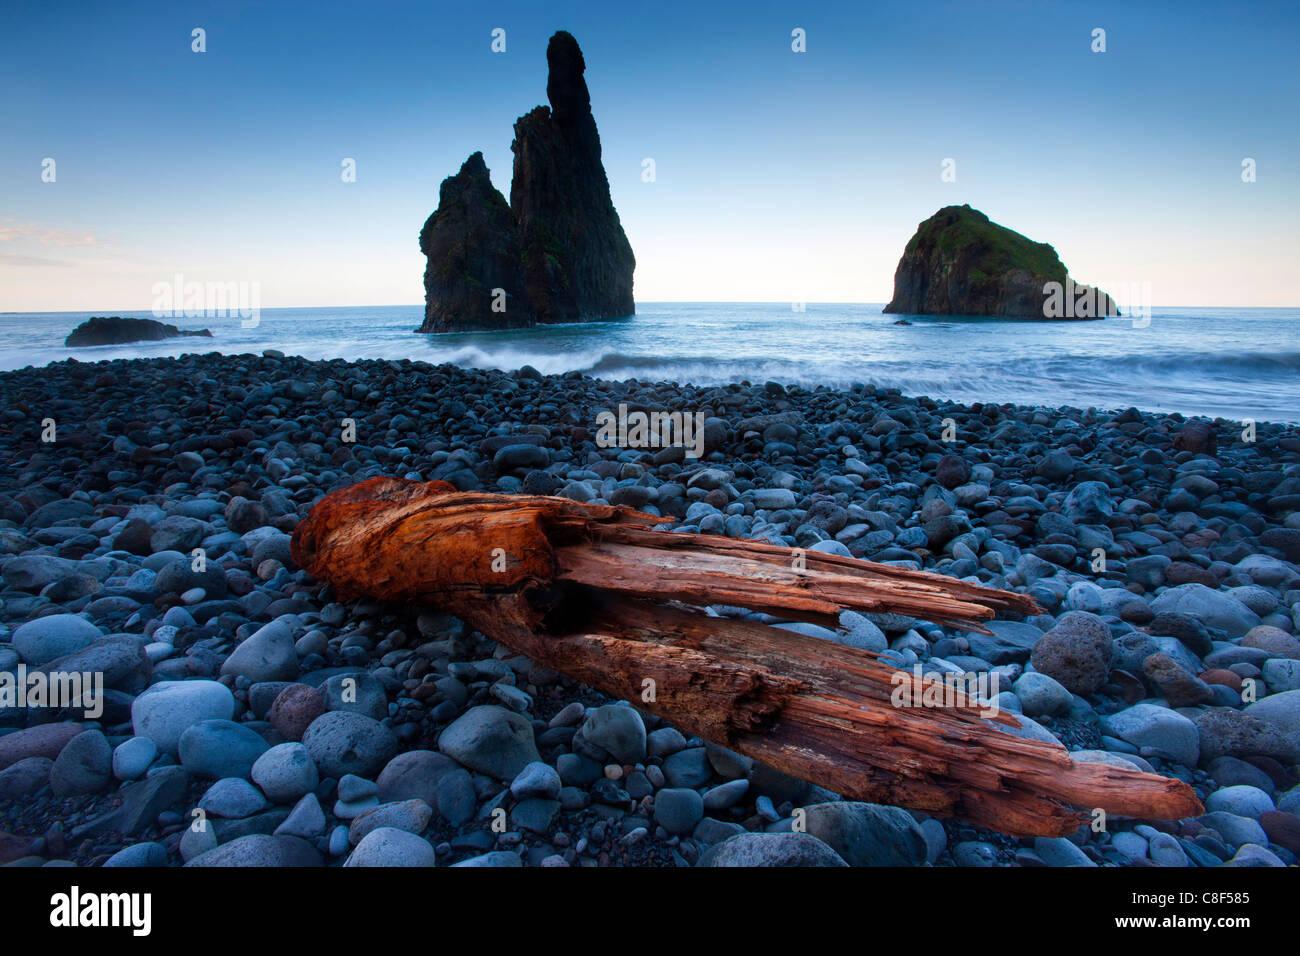 Ribeira there Janela, Portugal, Europe, Madeira, coast, sea, Atlantic, rock, cliff, pillar, erosion, waves, gravel - Stock Image